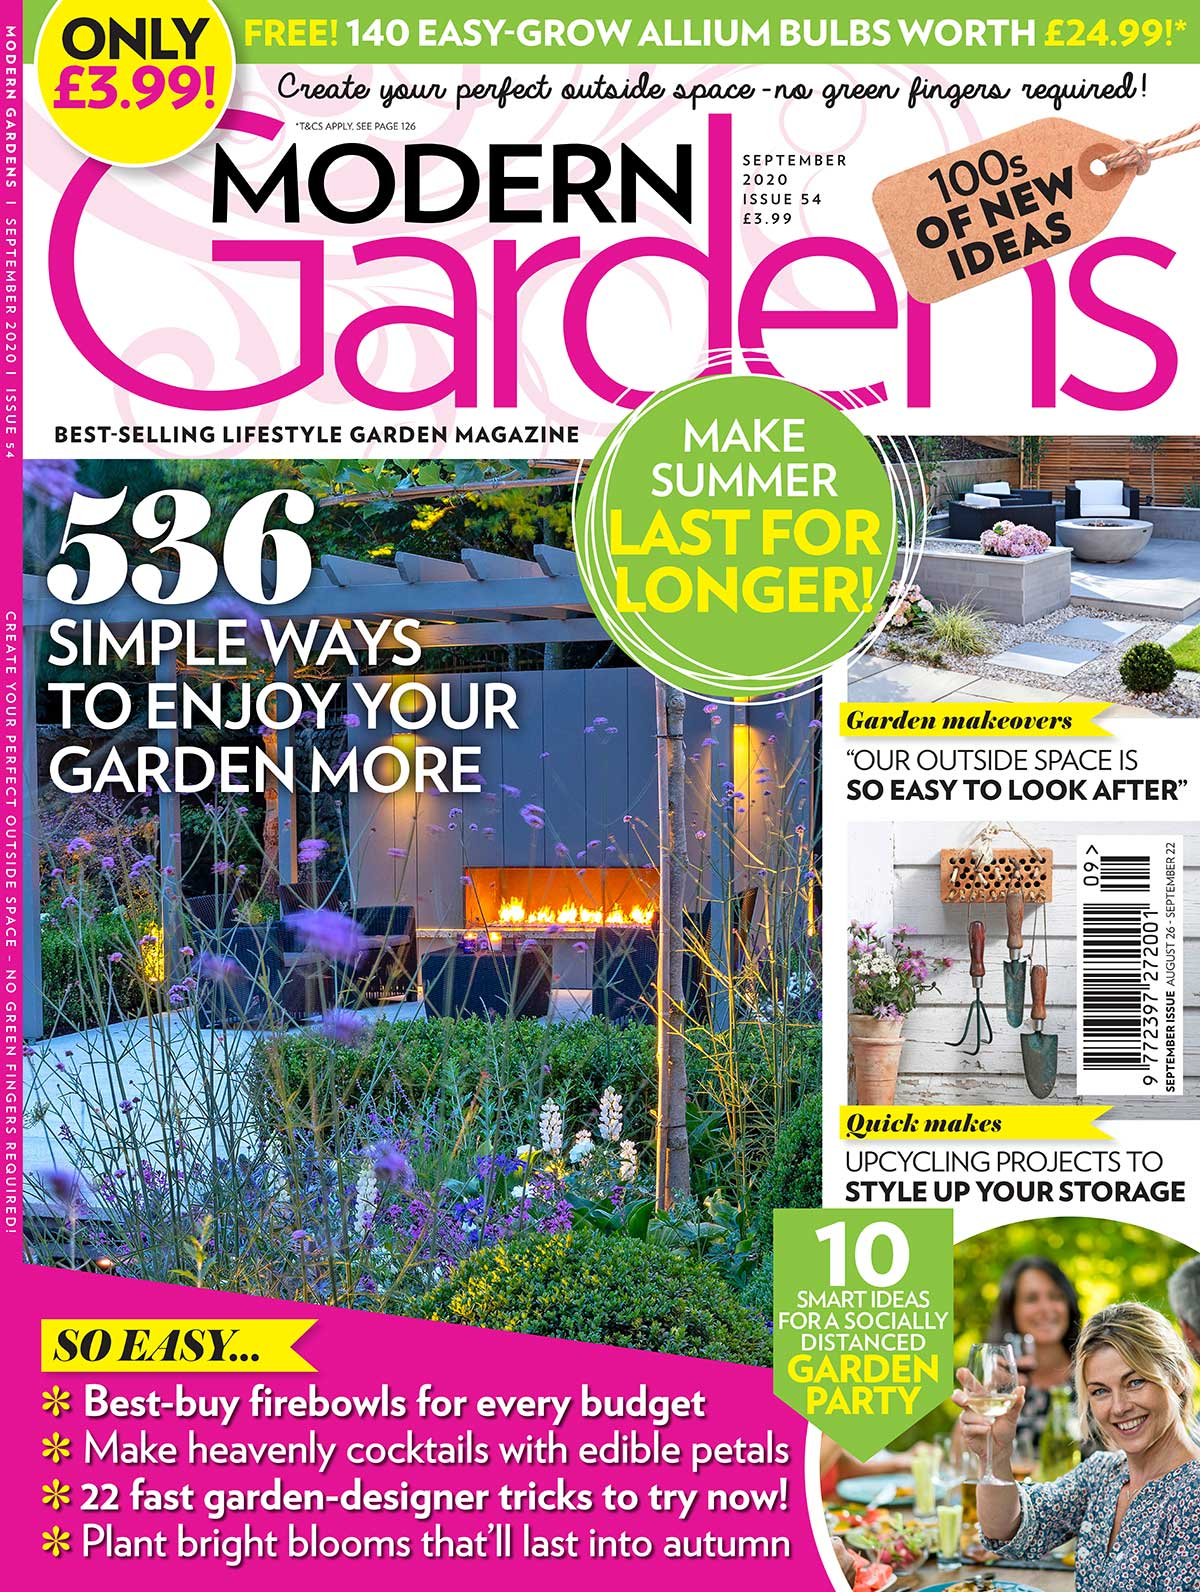 Landscapia Featured in Modern Gardens Magazine September 2020